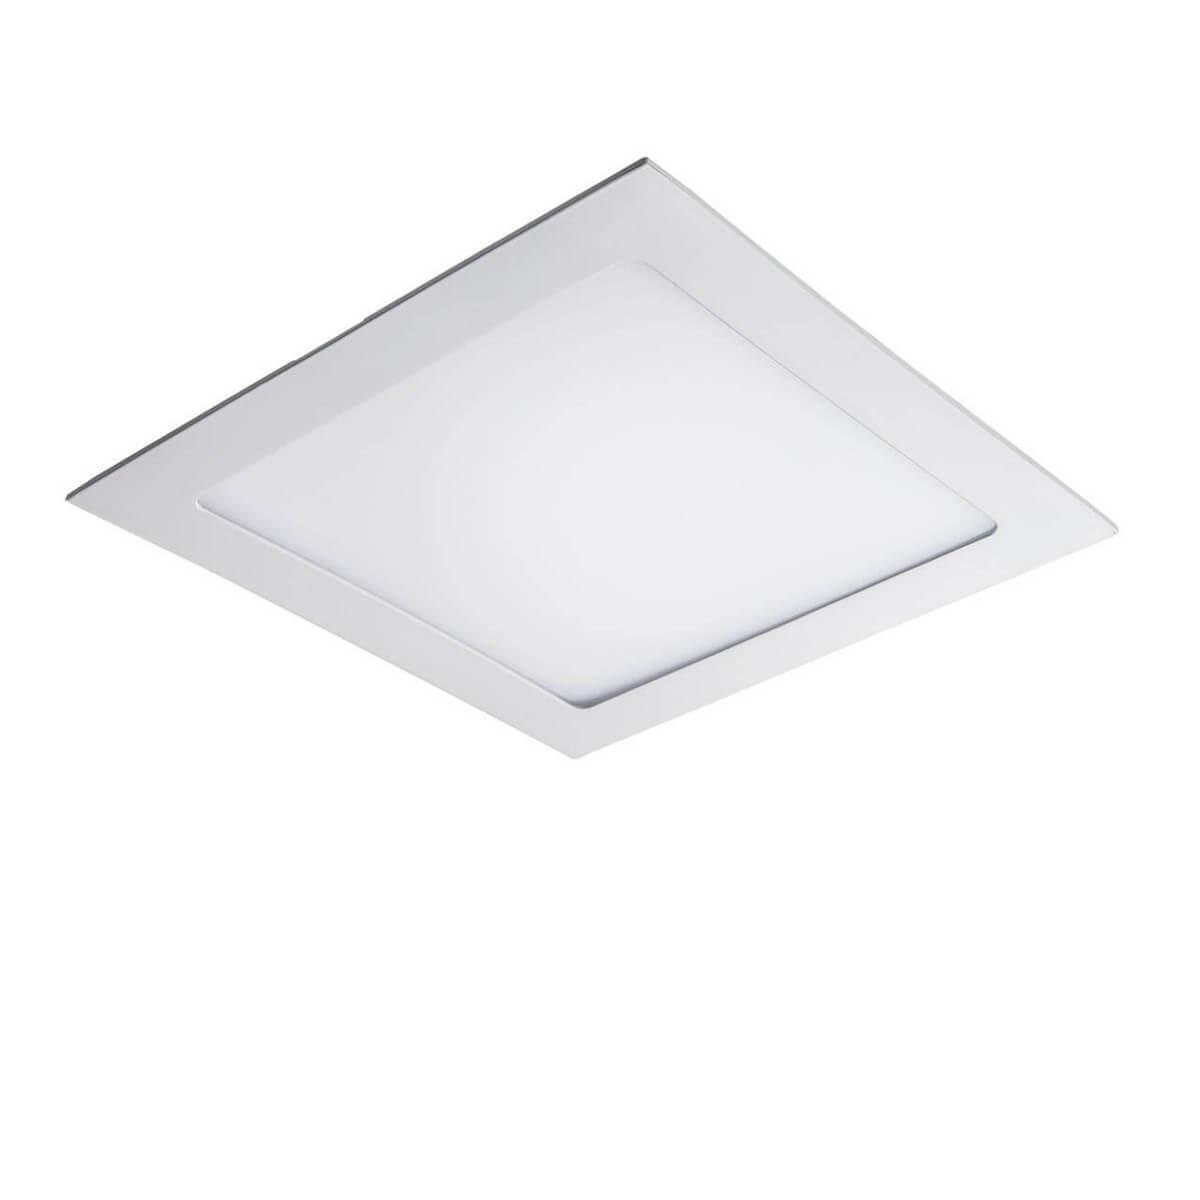 Светильник Lightstar 224184 Zocco LED фото